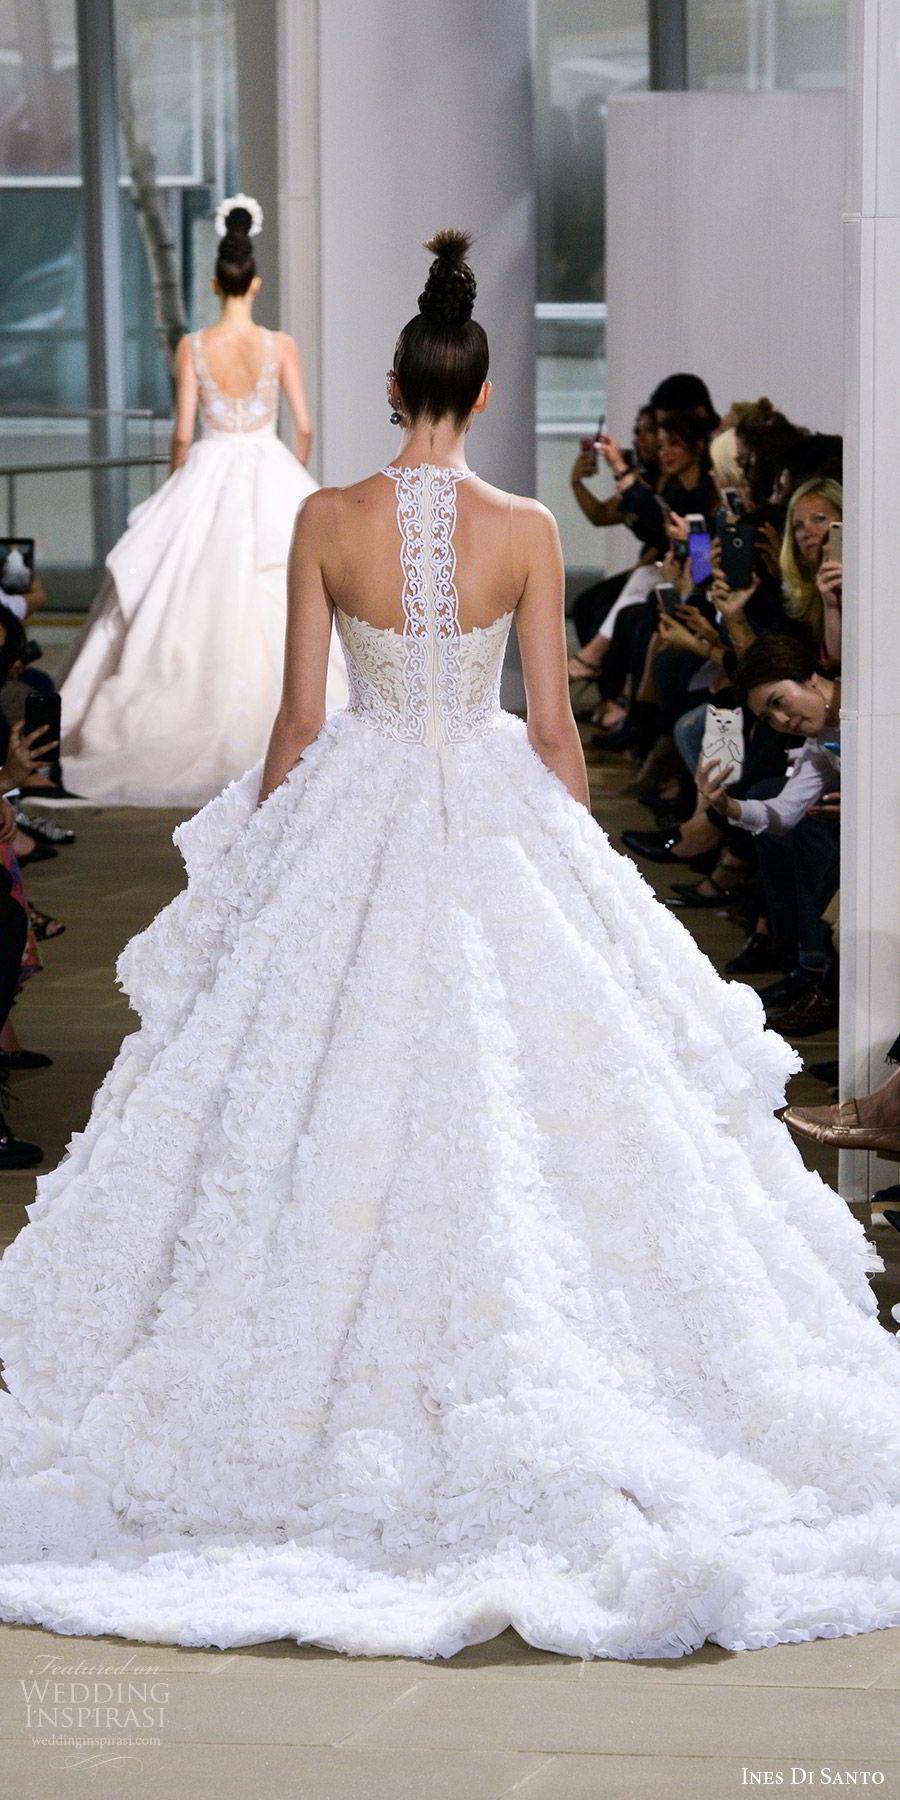 ines di santo spring 2018 bridal sleeveless illusion halter neck ball gown wedding dress (kensington) bv ruffle tier skirt lace racer back